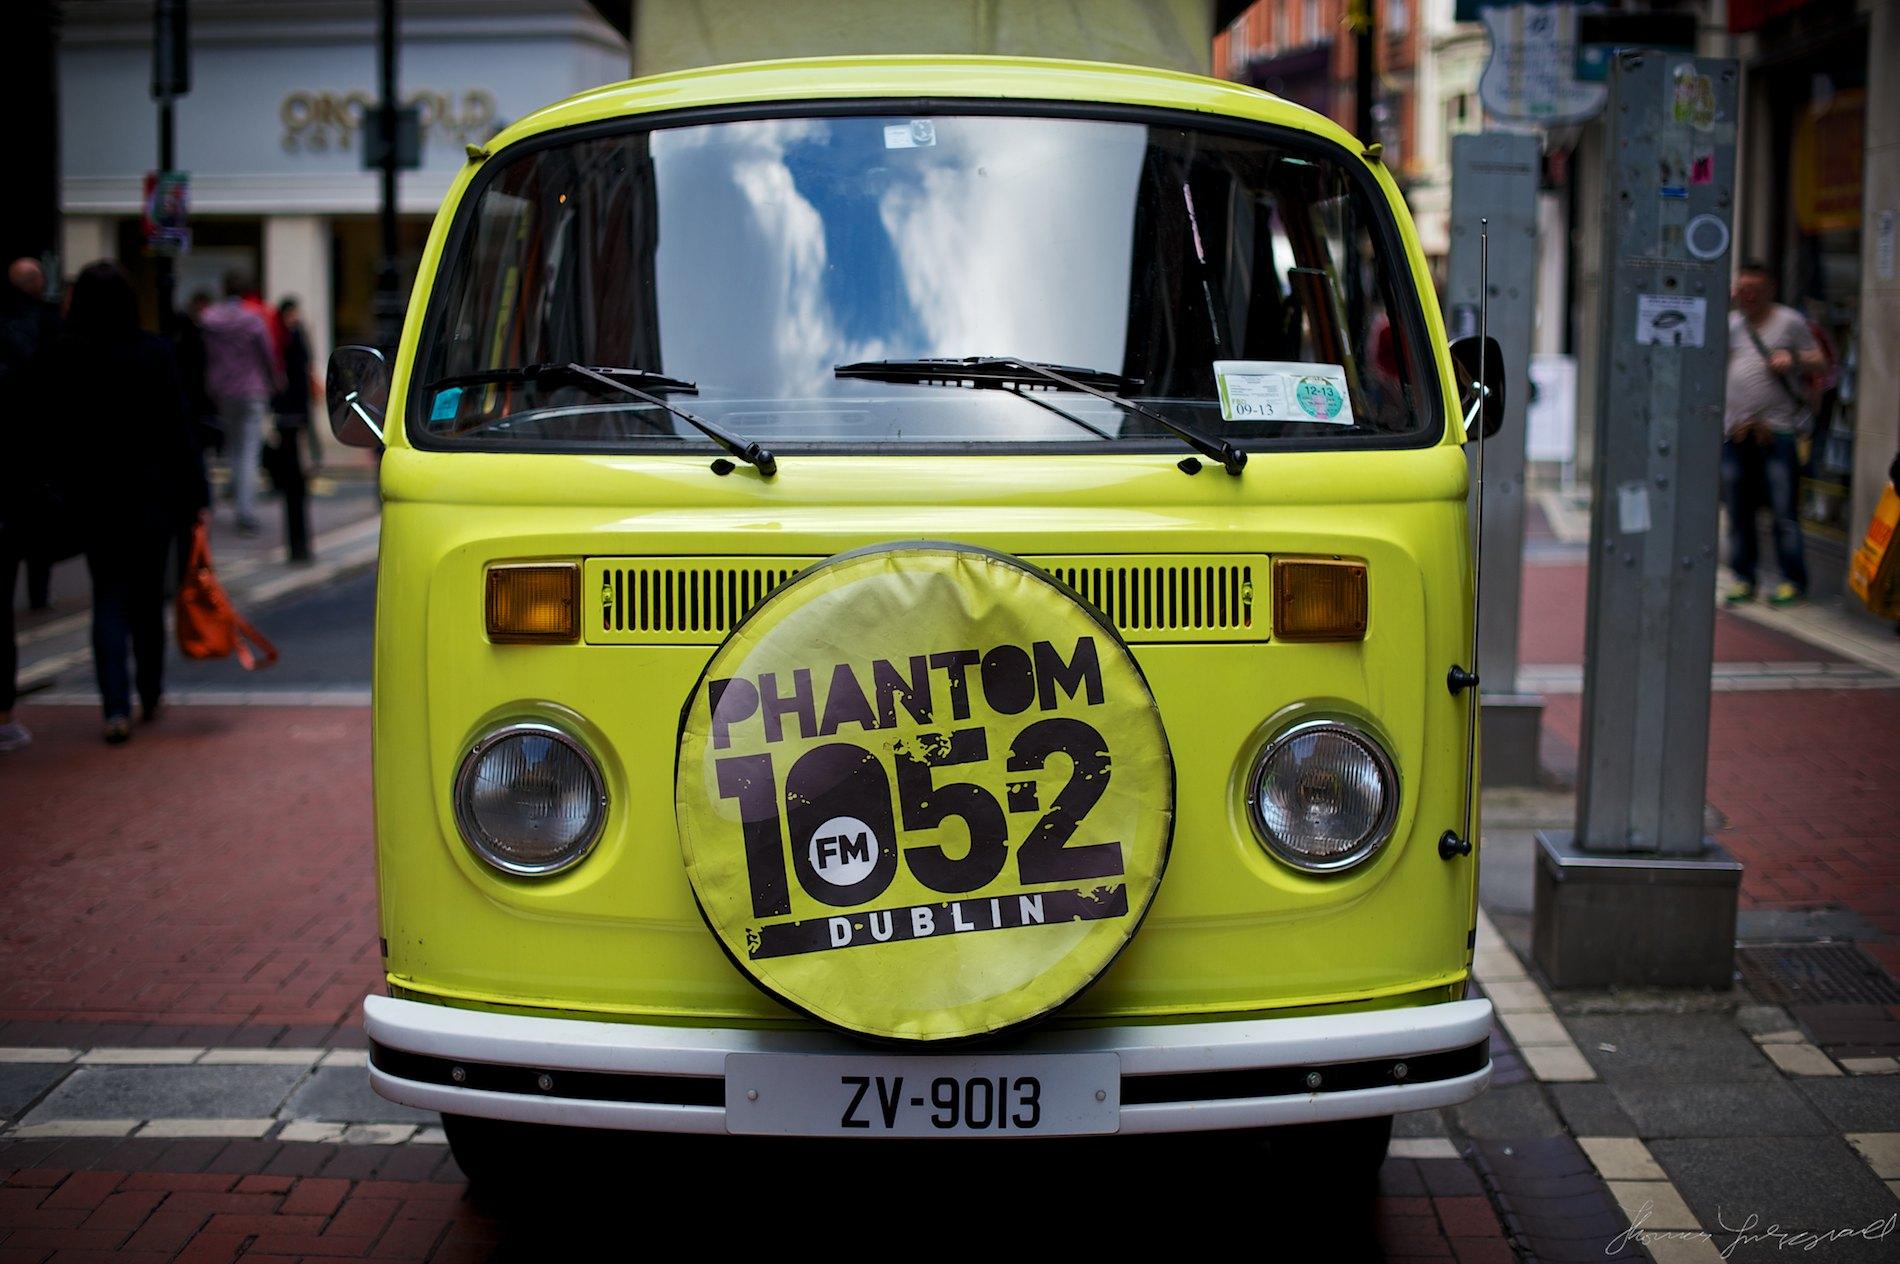 Phantom FM